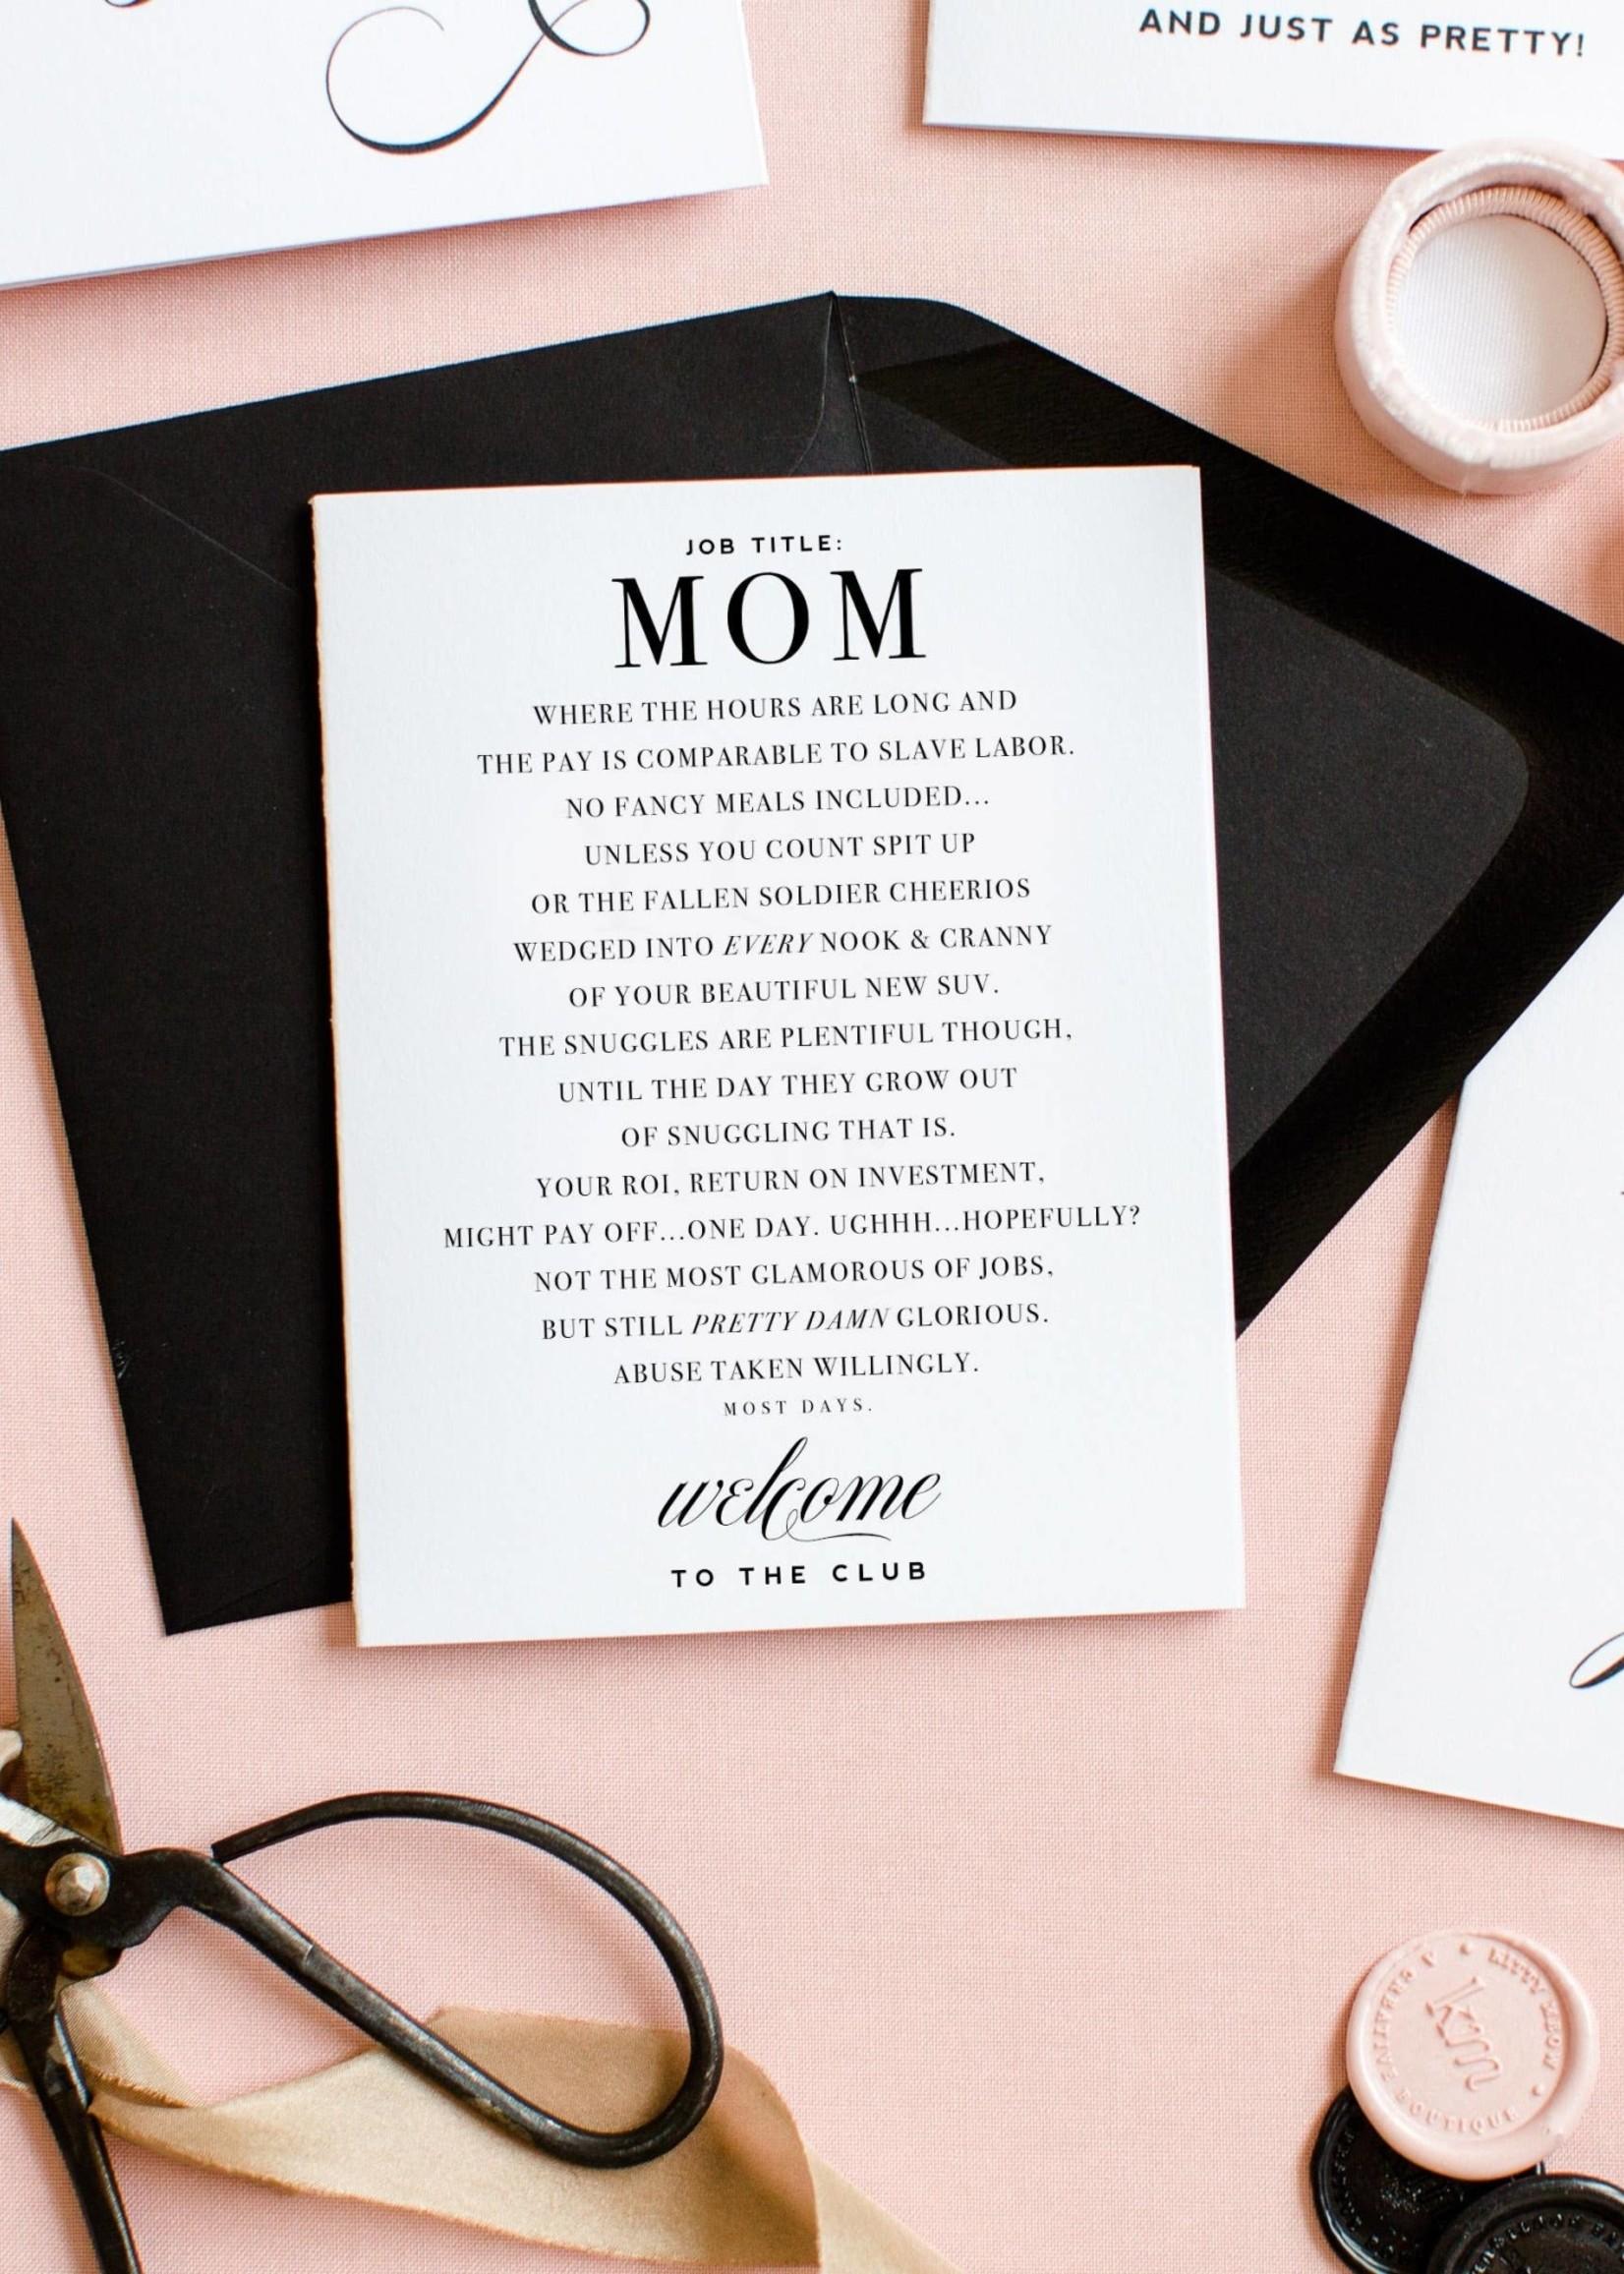 Mom Club - Funny New Mom Card & Mom Friendship Card